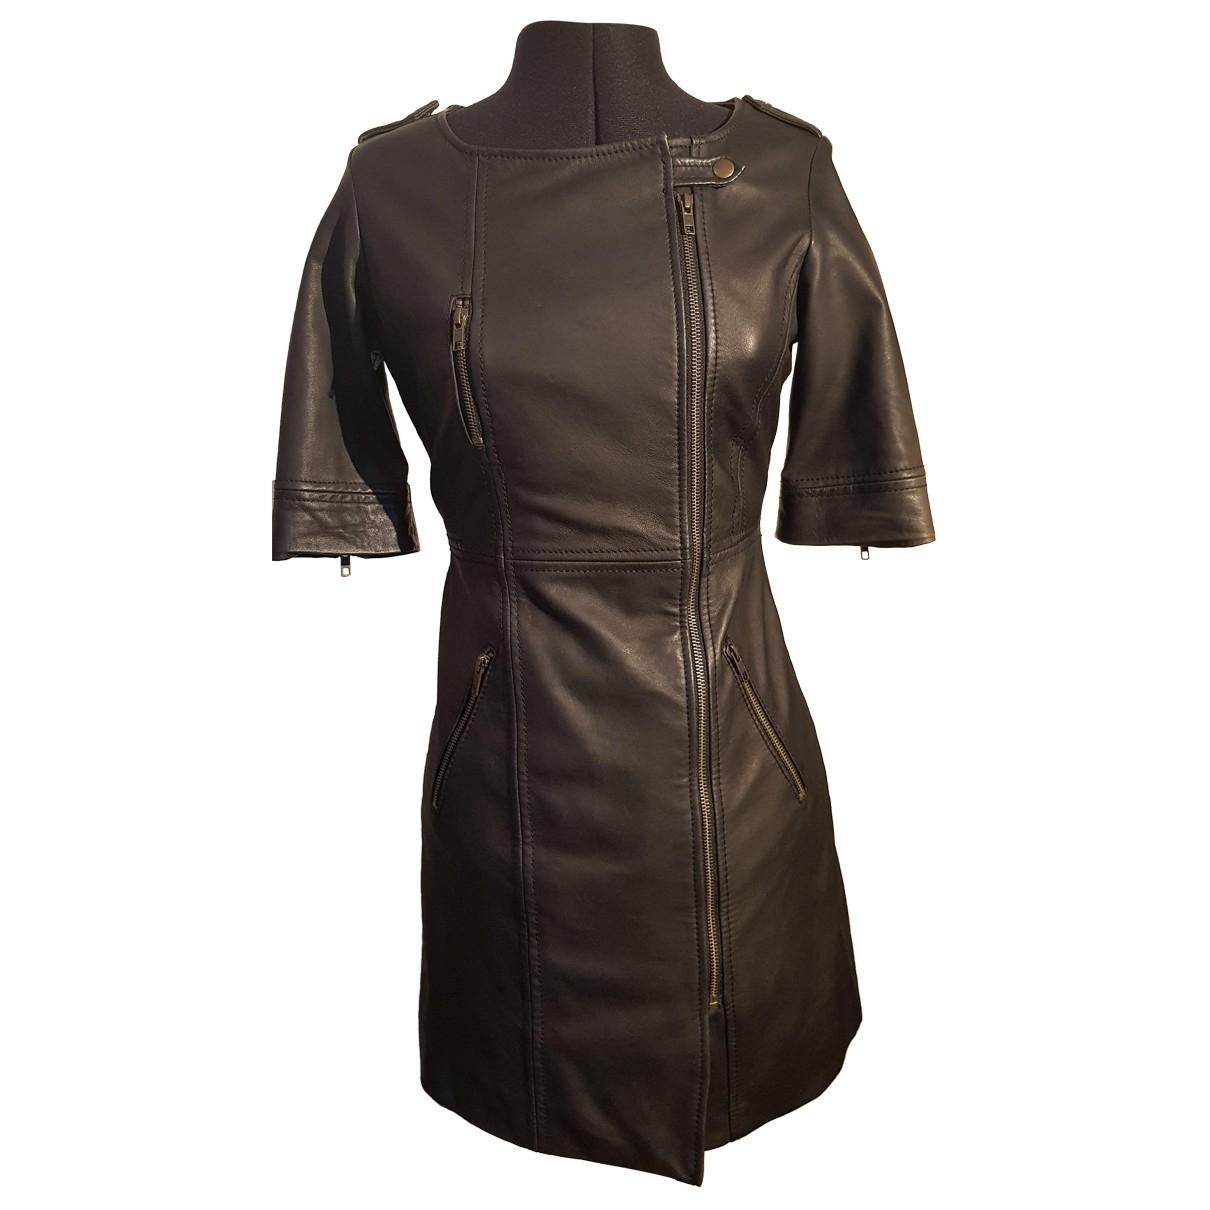 Supertrash \N Black Leather dress for Women S International